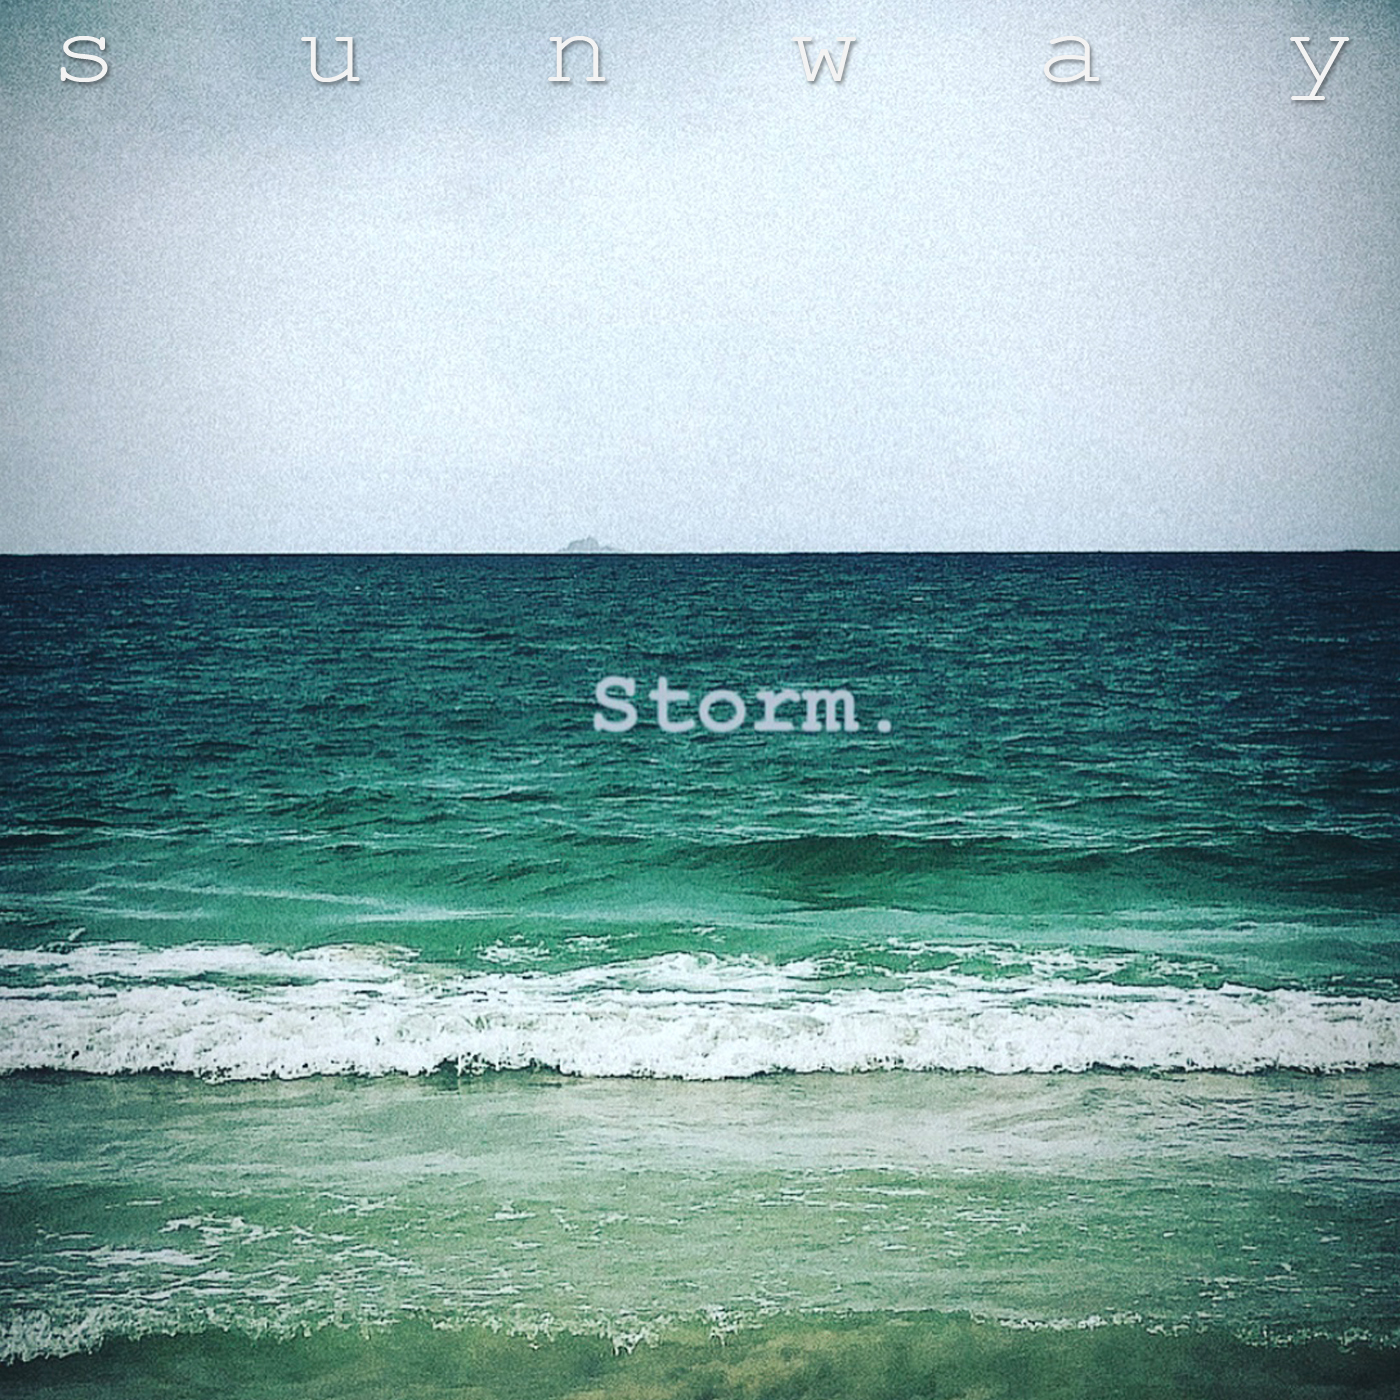 Sunway - STORM